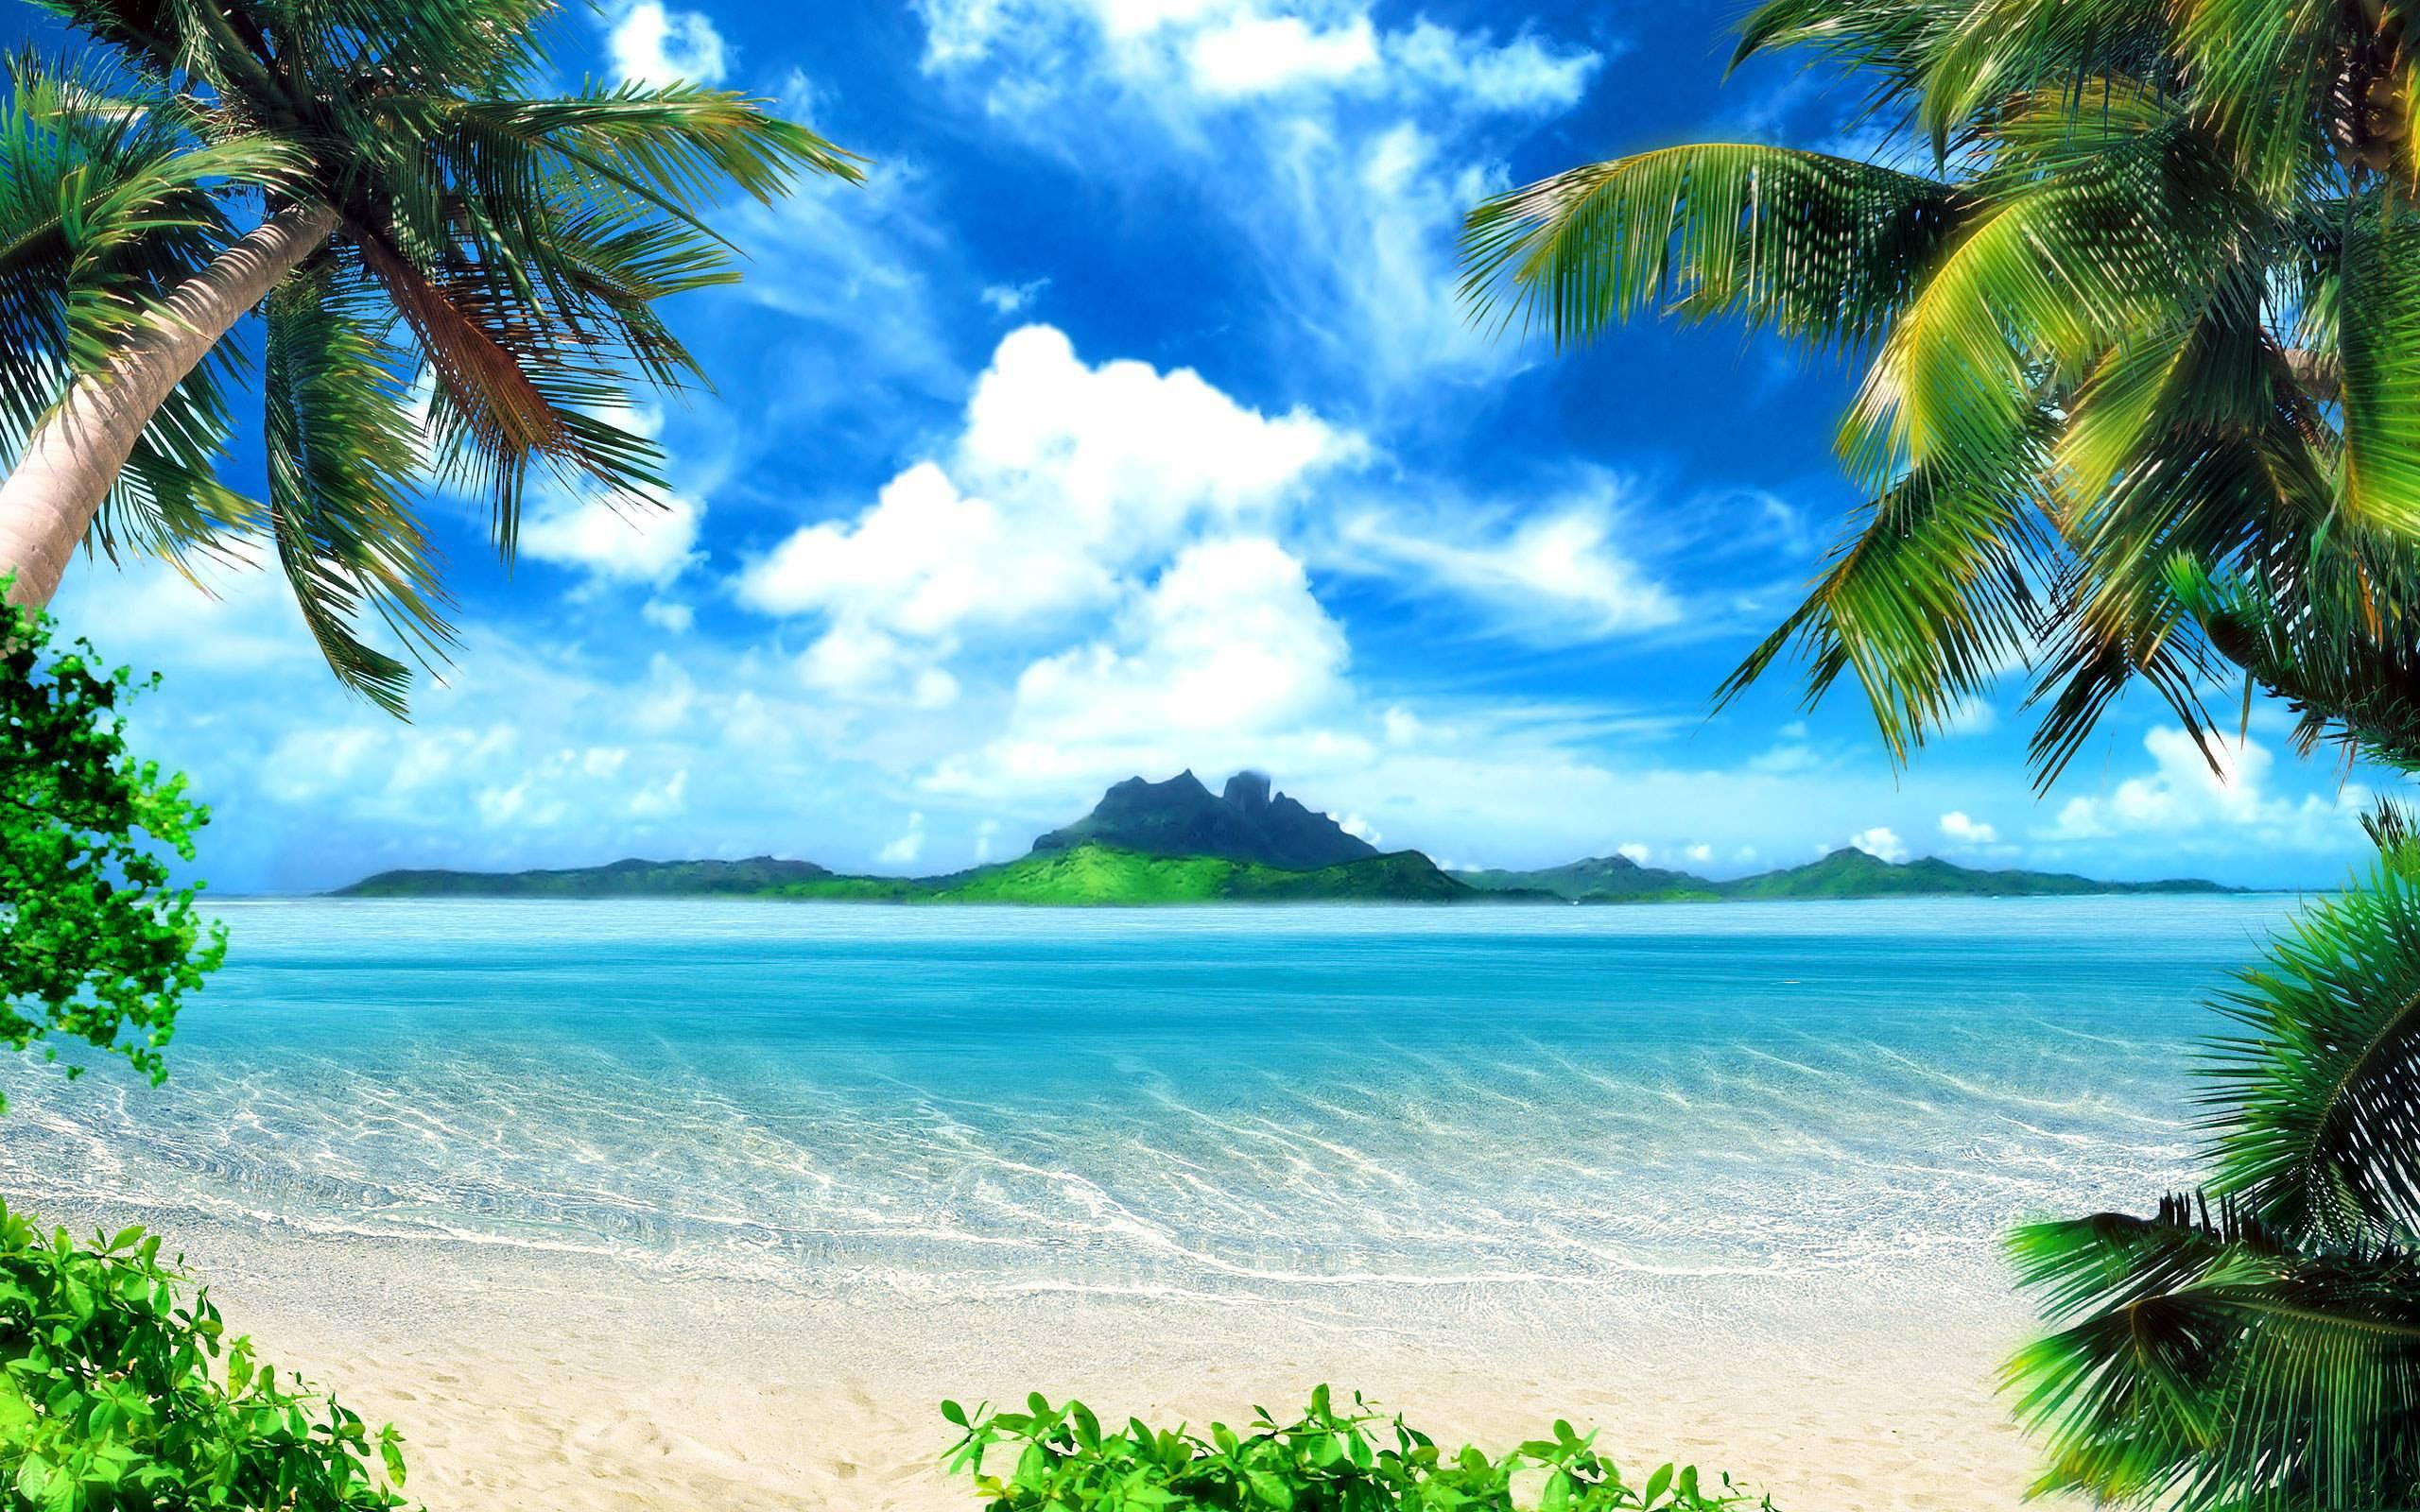 Tropical Beach Backgrounds - Wallpaper Cave